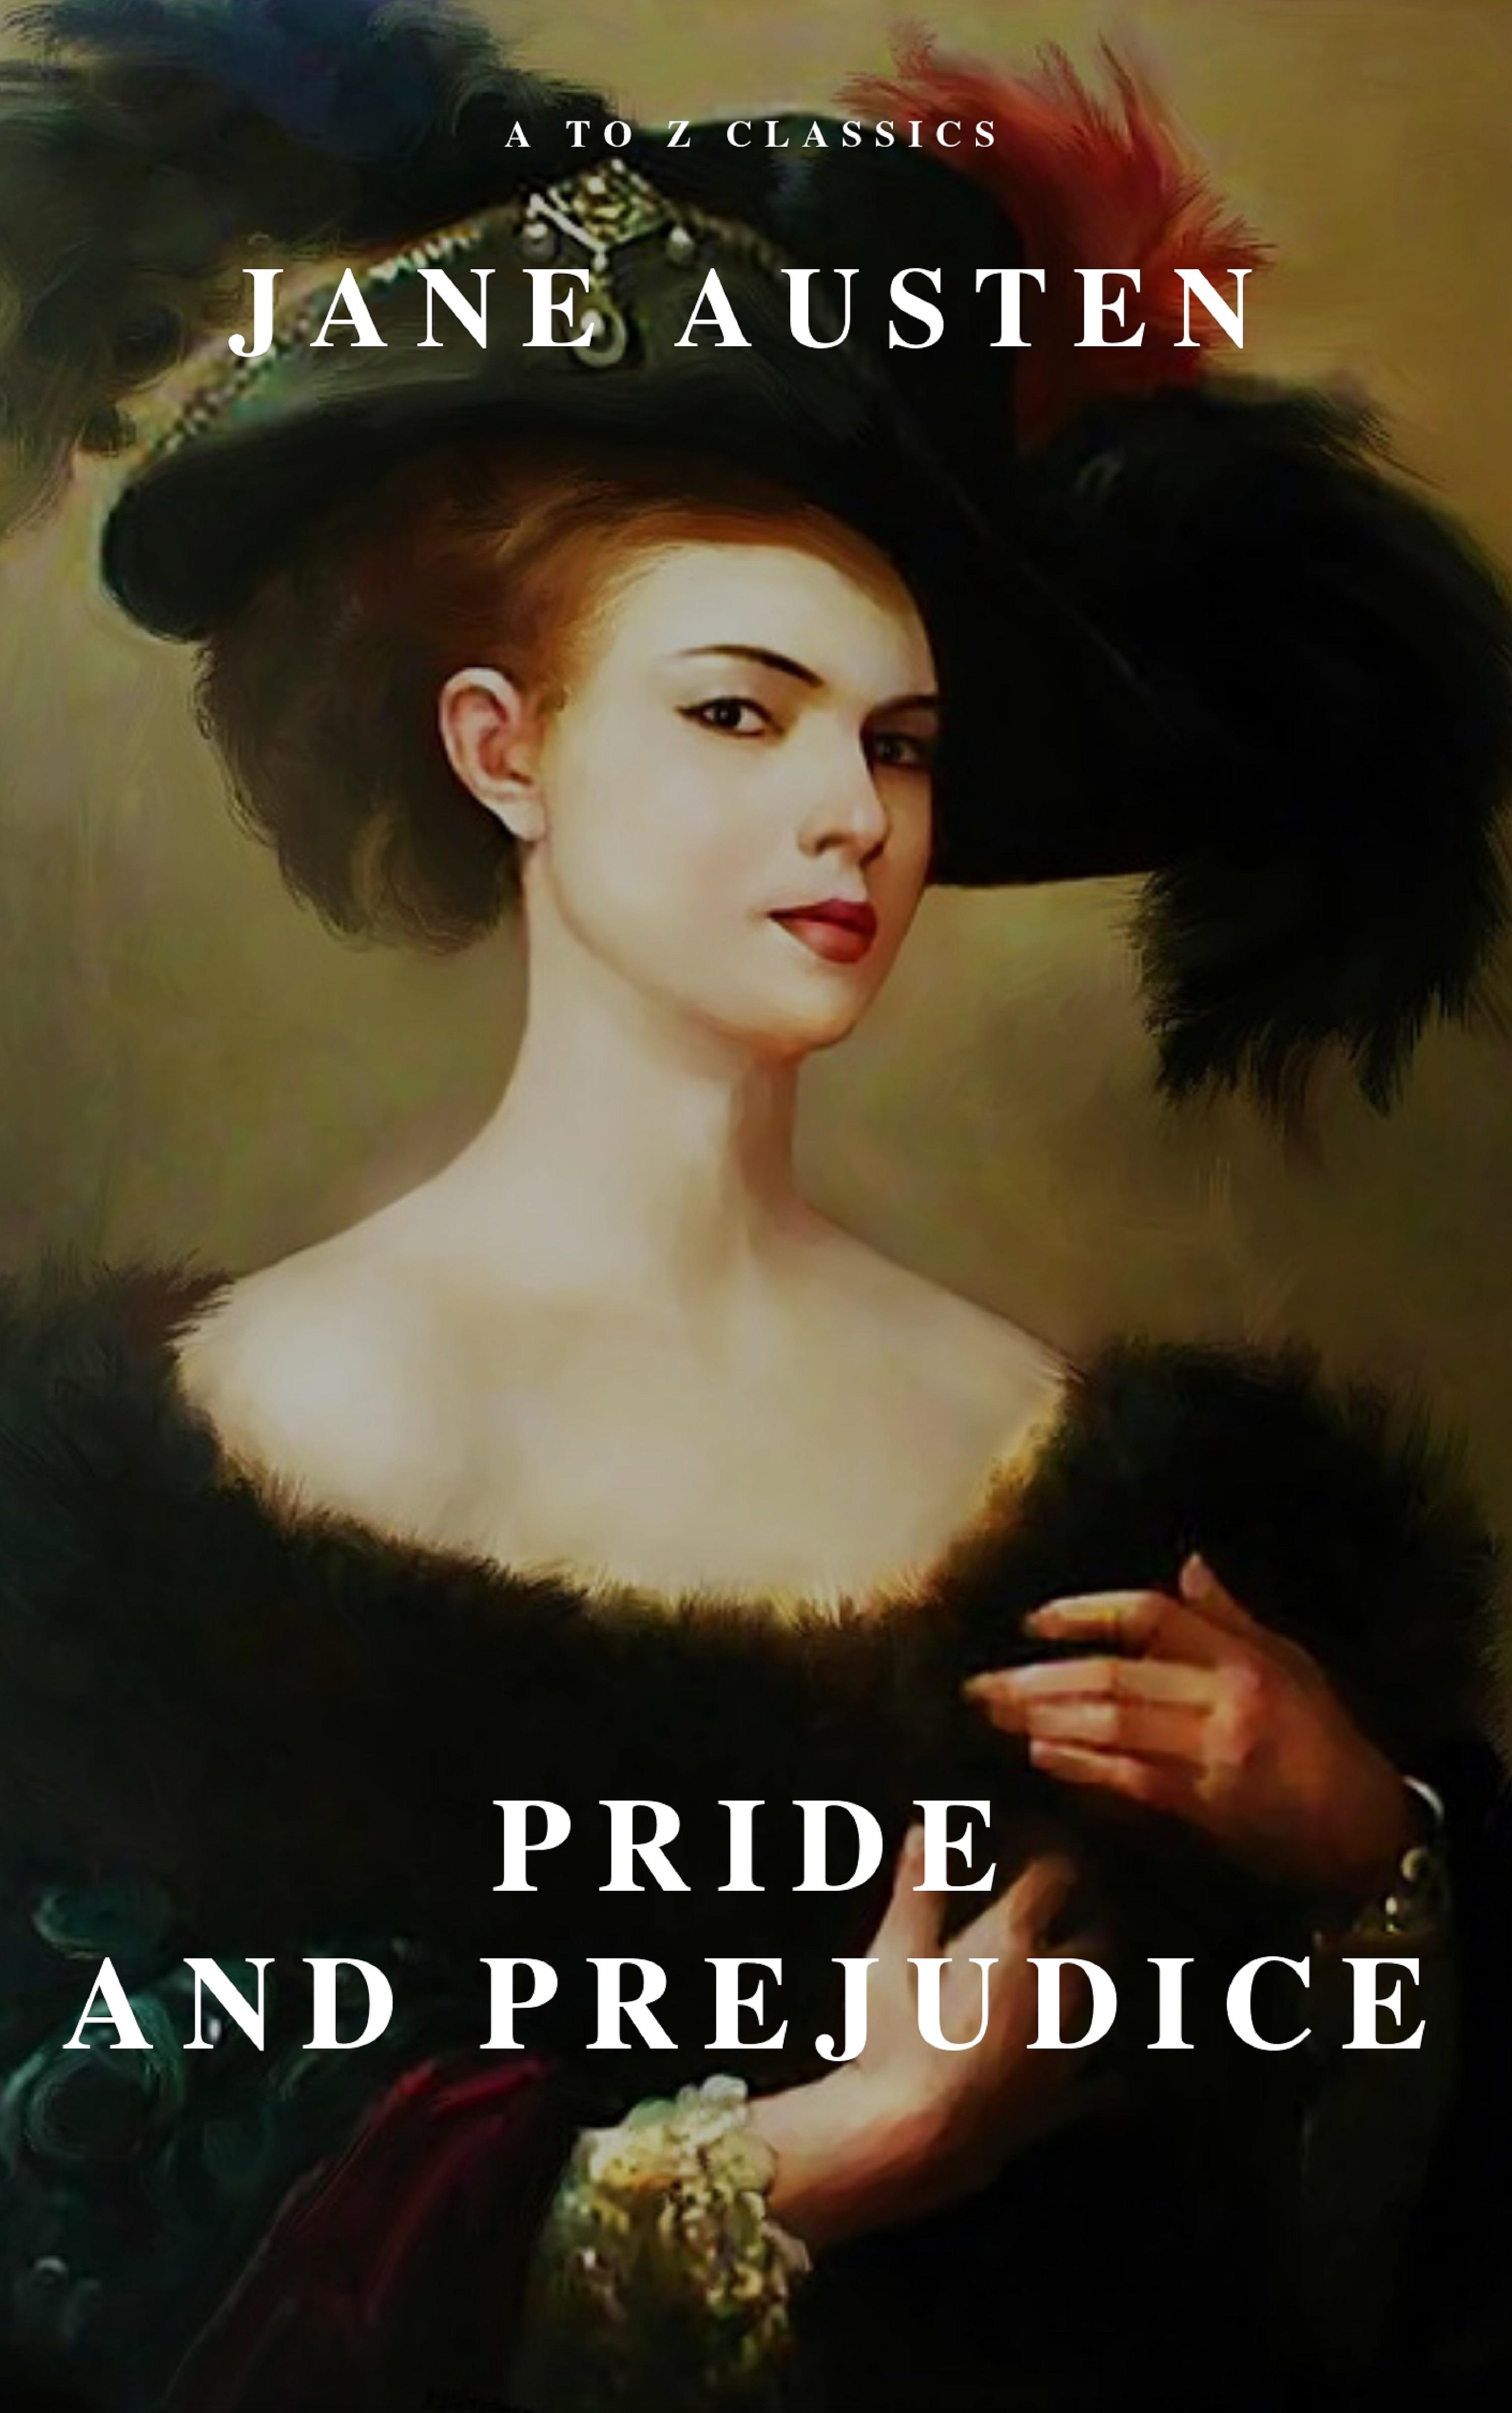 pride and prejudice a to z classics